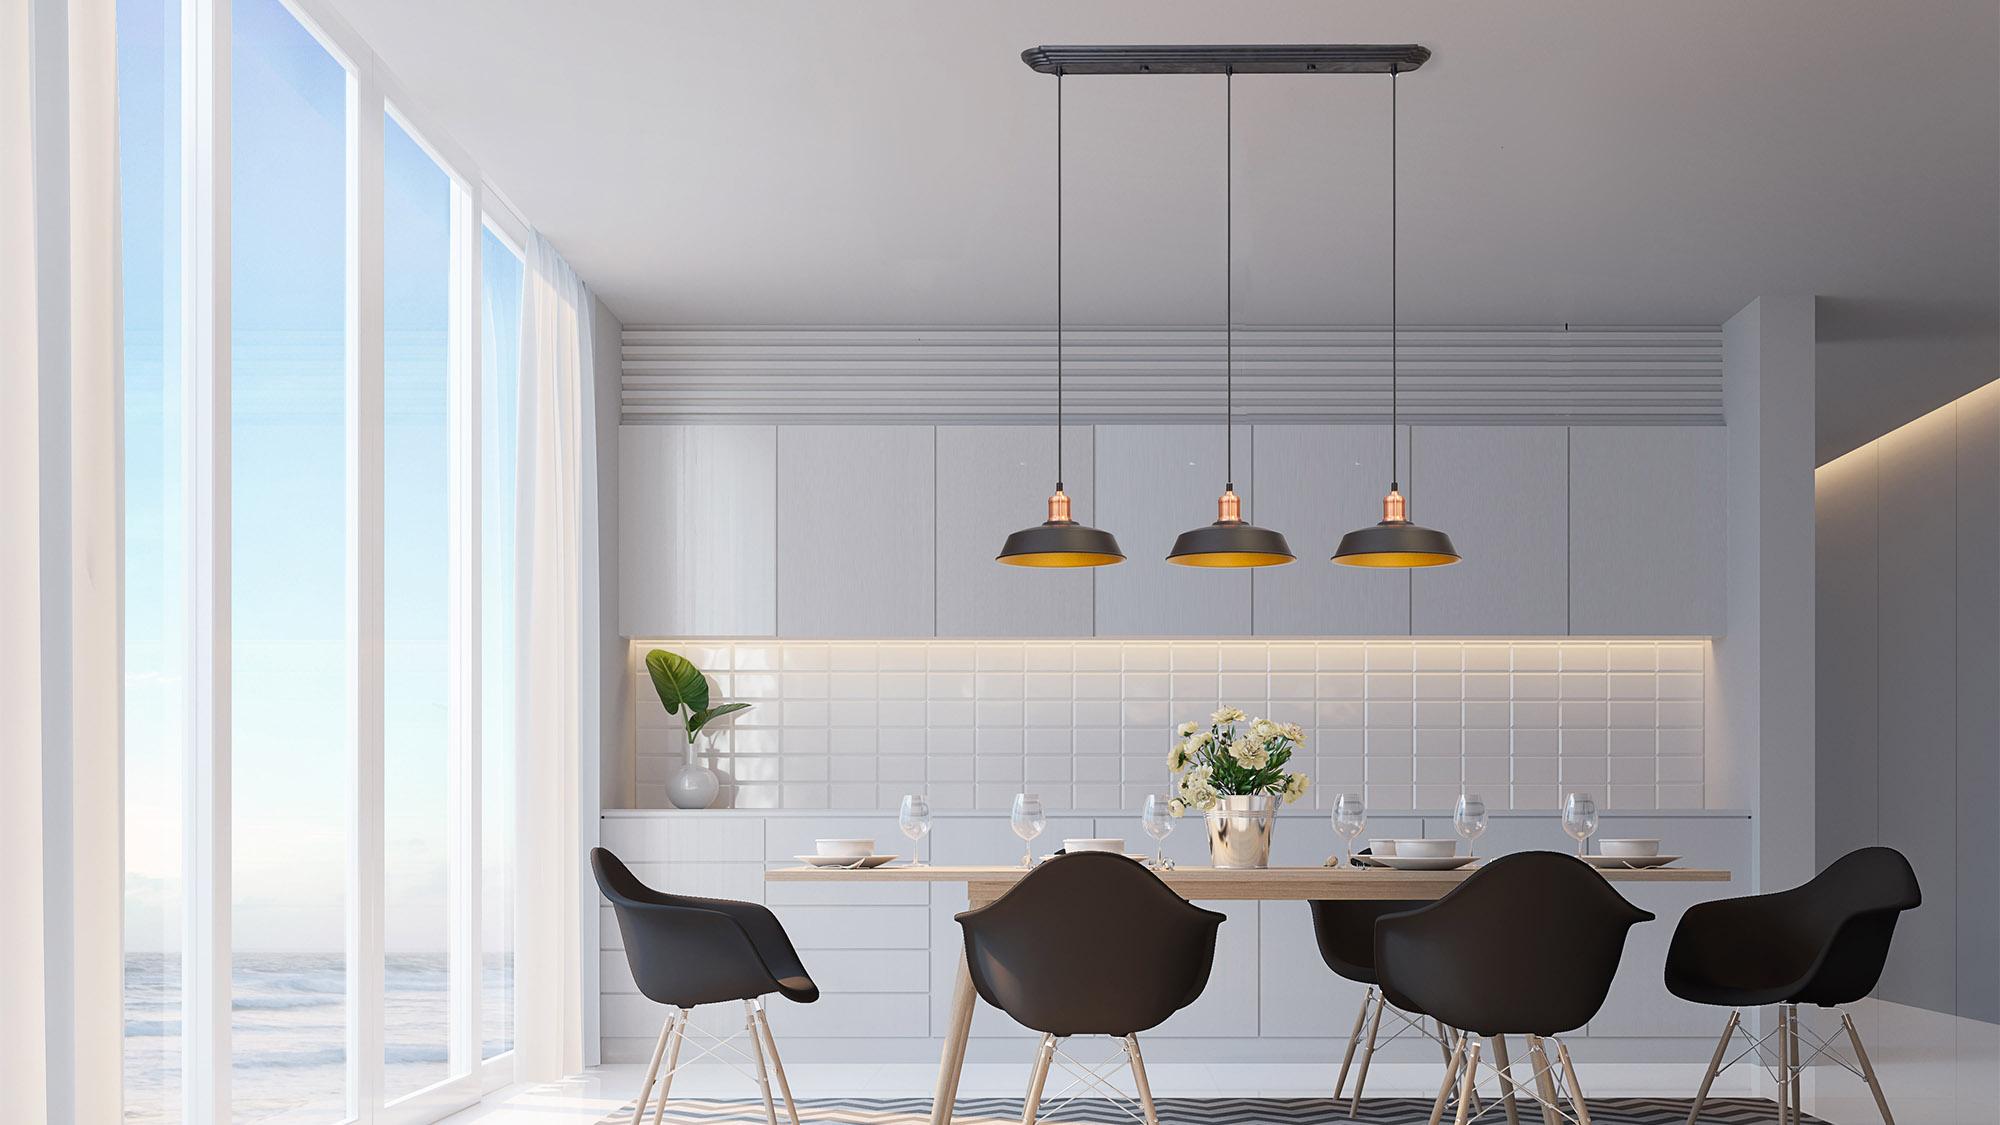 lighting kitchen vertical shelf dividers design tips the warehouse tris